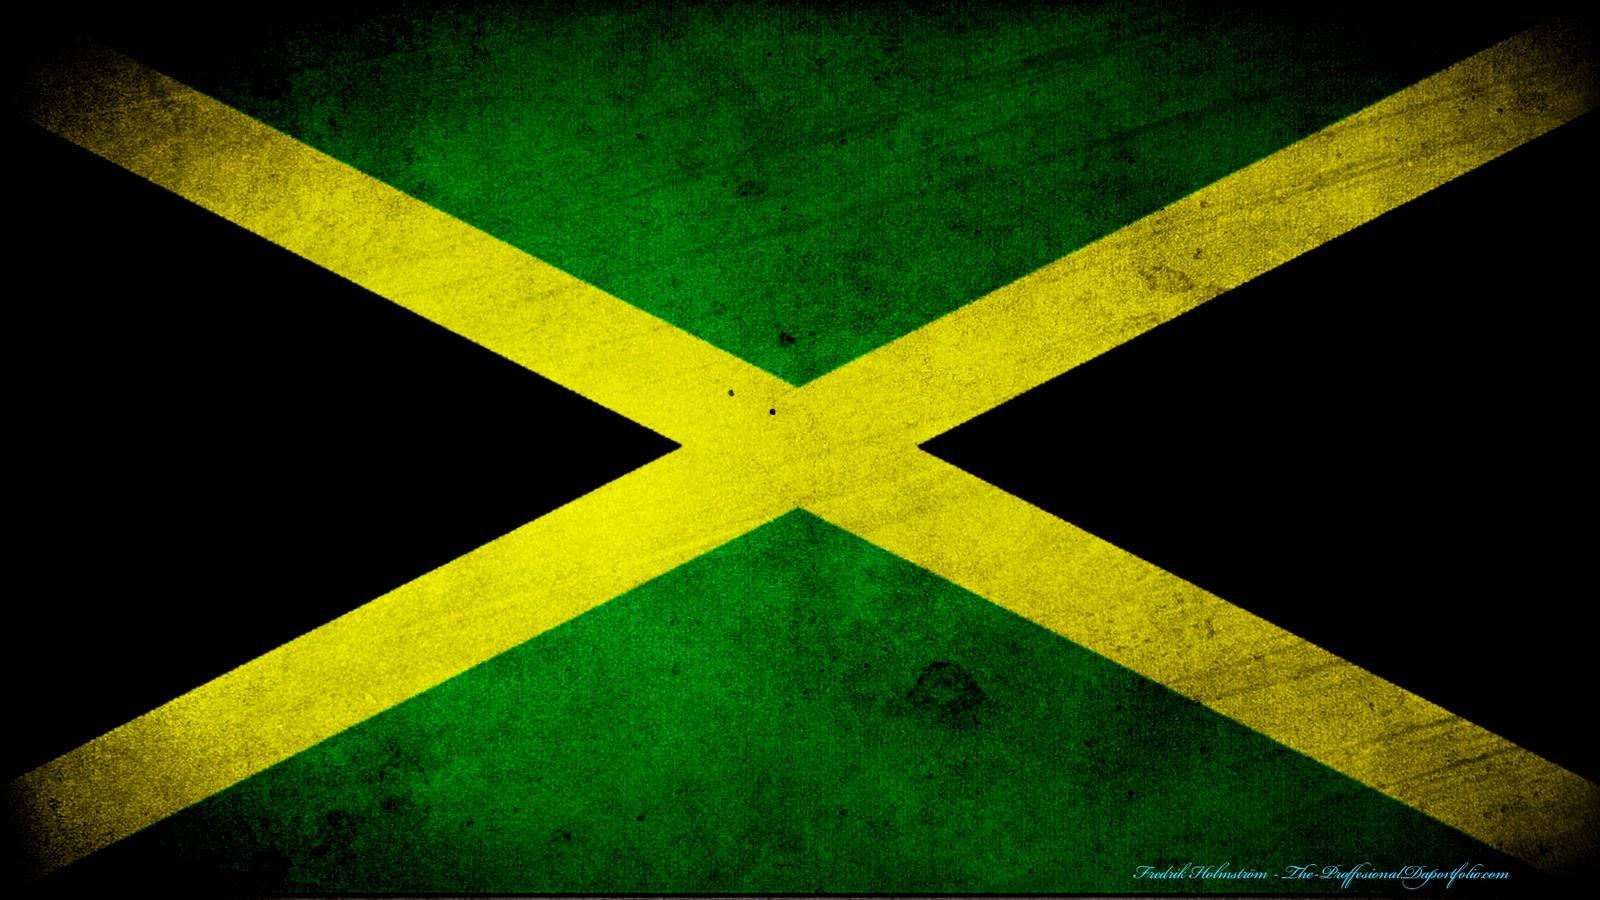 http://3.bp.blogspot.com/_gqDErou7OvM/TUyu3cWhWxI/AAAAAAAAALo/5u9zjB8HwiA/s1600/Jamaica_flag_grunge_wallpaper_by_The_proffesional.jpg